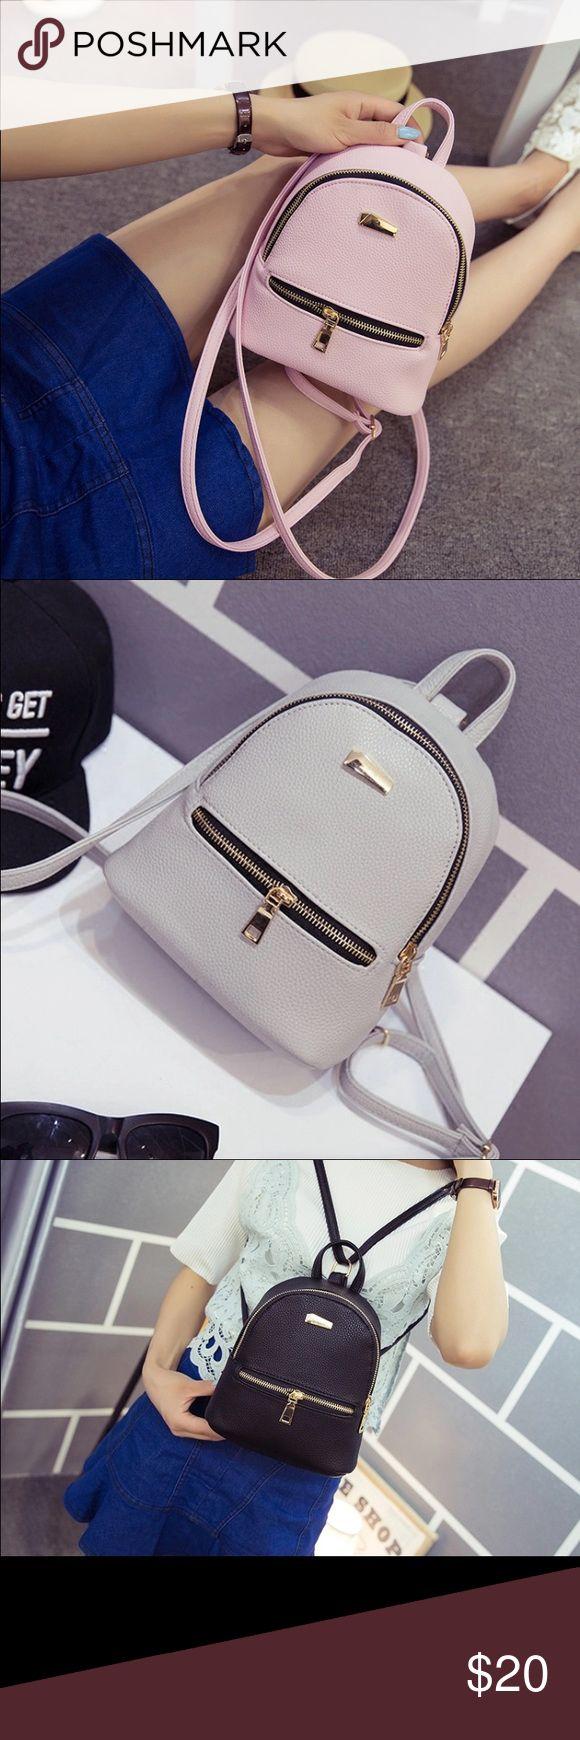 25 best ideas about kipling backpack on pinterest school handbags - Small Backpack Grey Black Or Pink Leather Mini Backpack 19 20 11